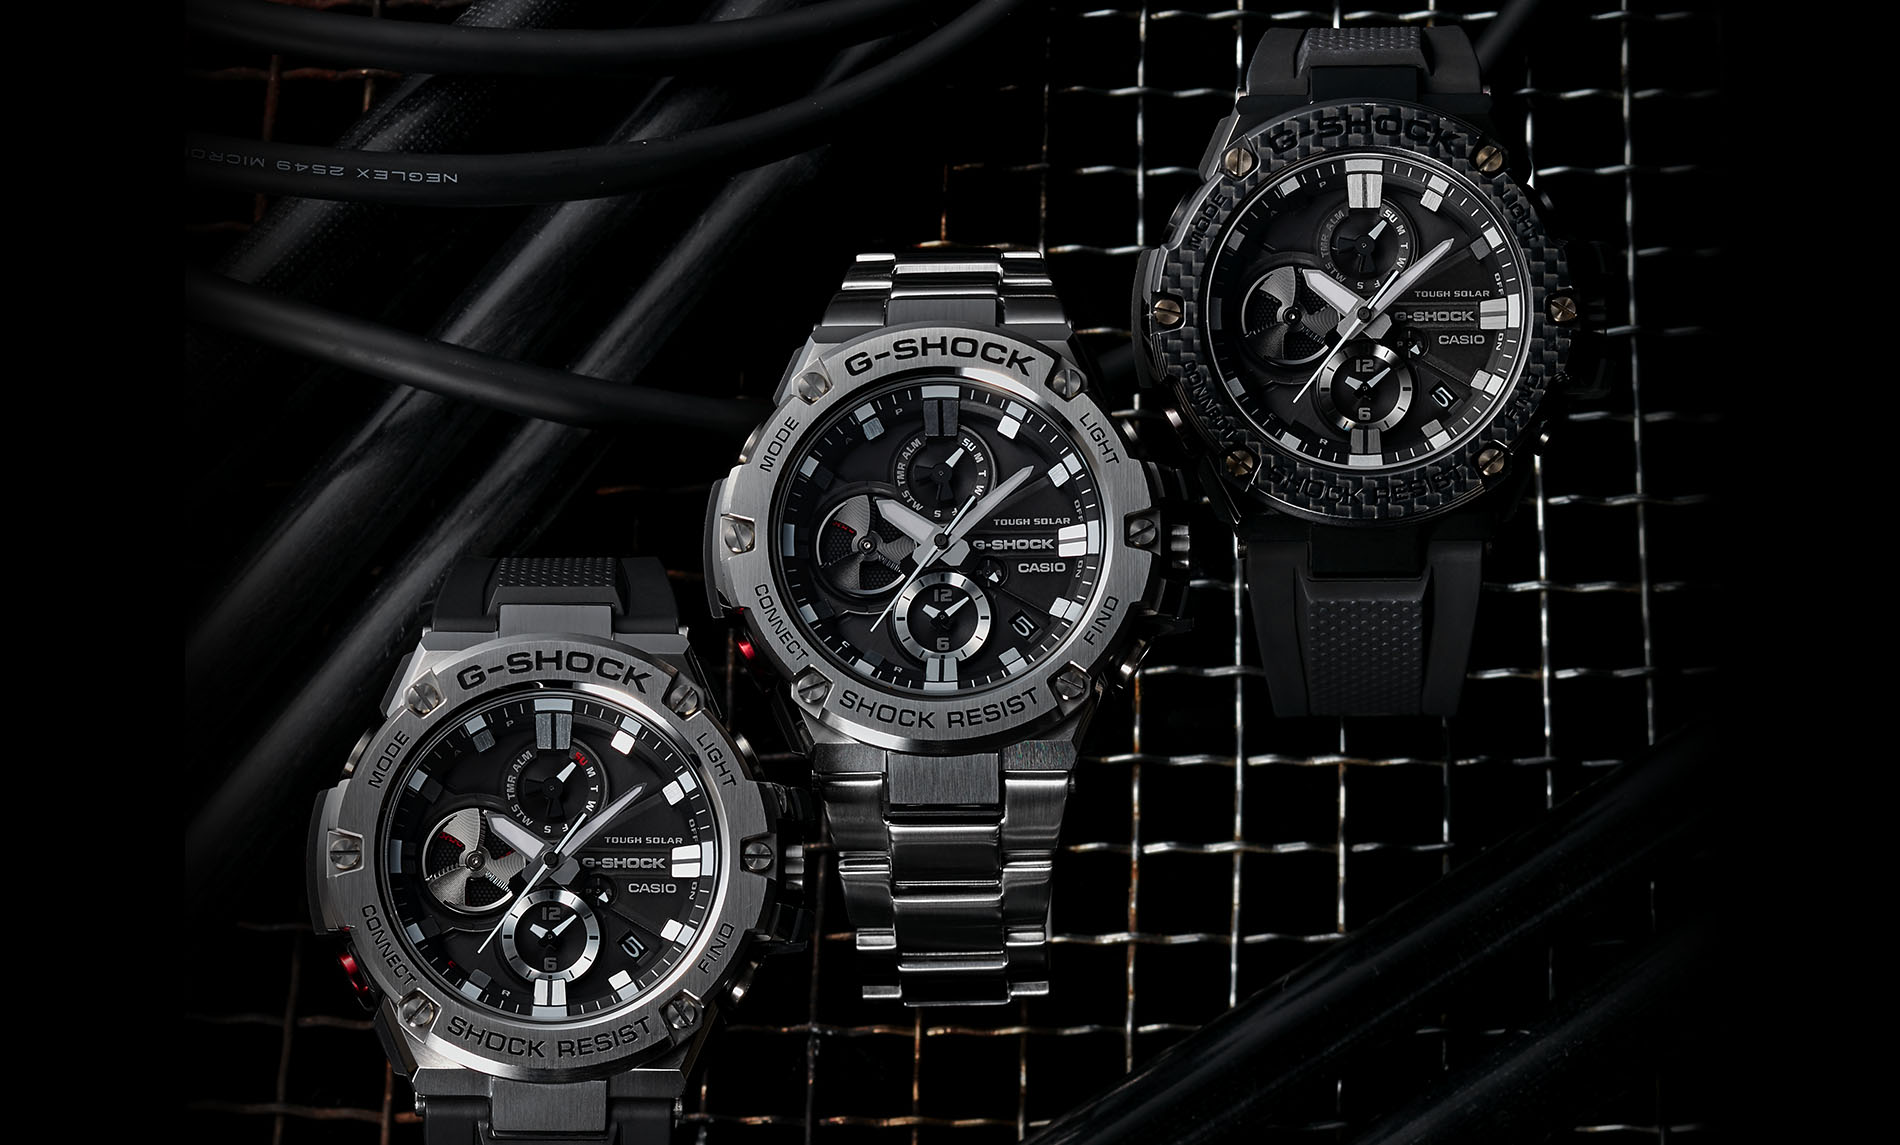 Zegarek męski Casio g-shock g-steel GST-B100D-1AER - duże 7